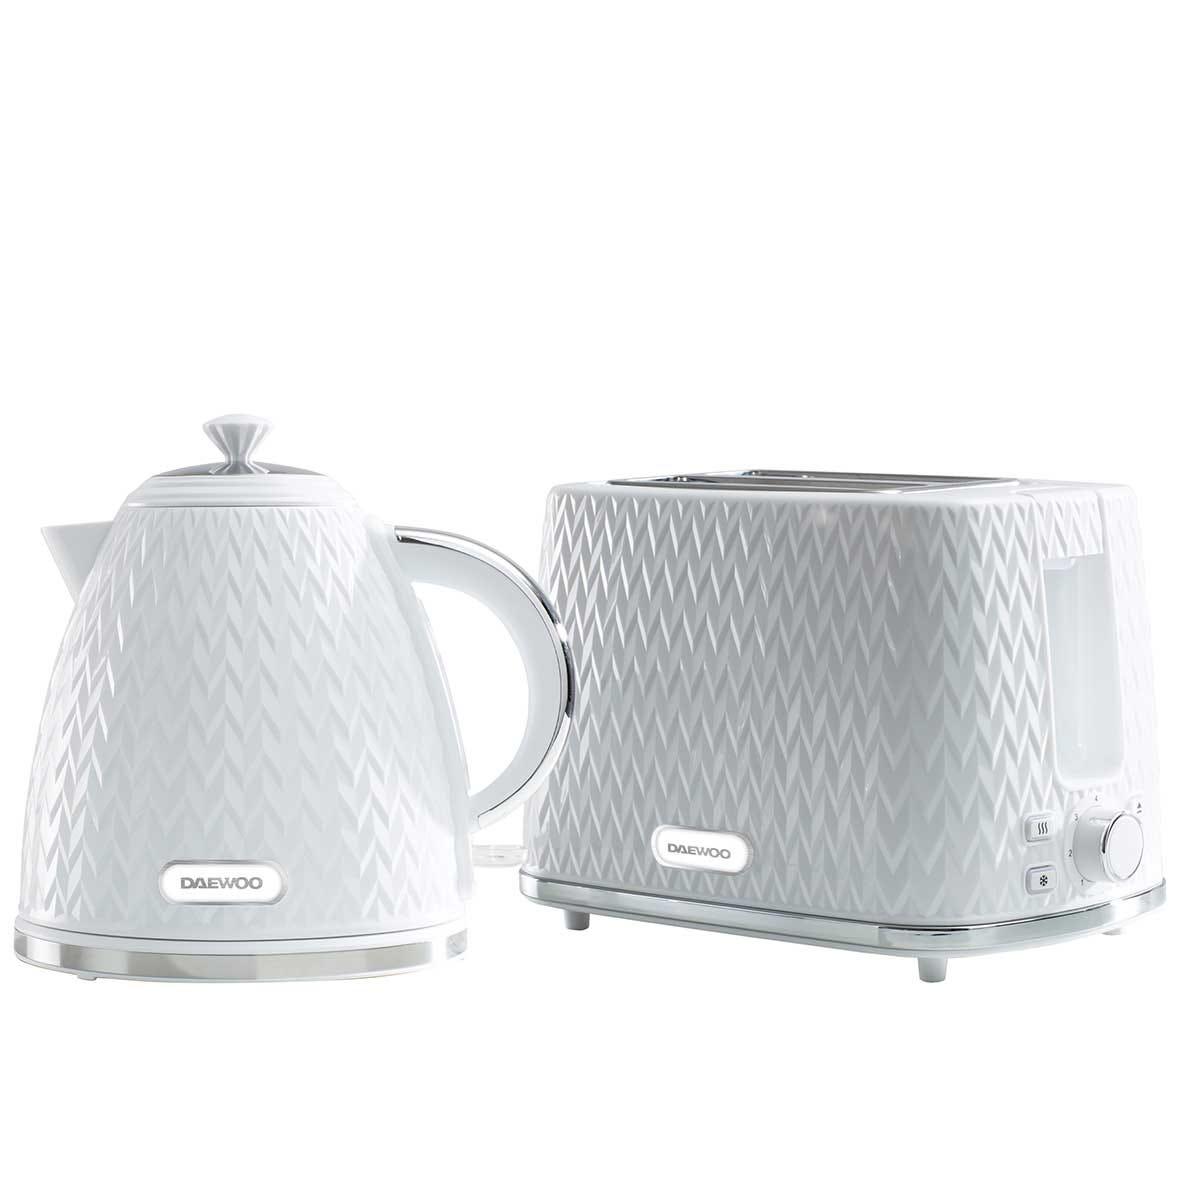 Daewoo SDA2393DS Argyle 1.7L 3KW Jug Kettle and 2 Slice Toaster Set - White